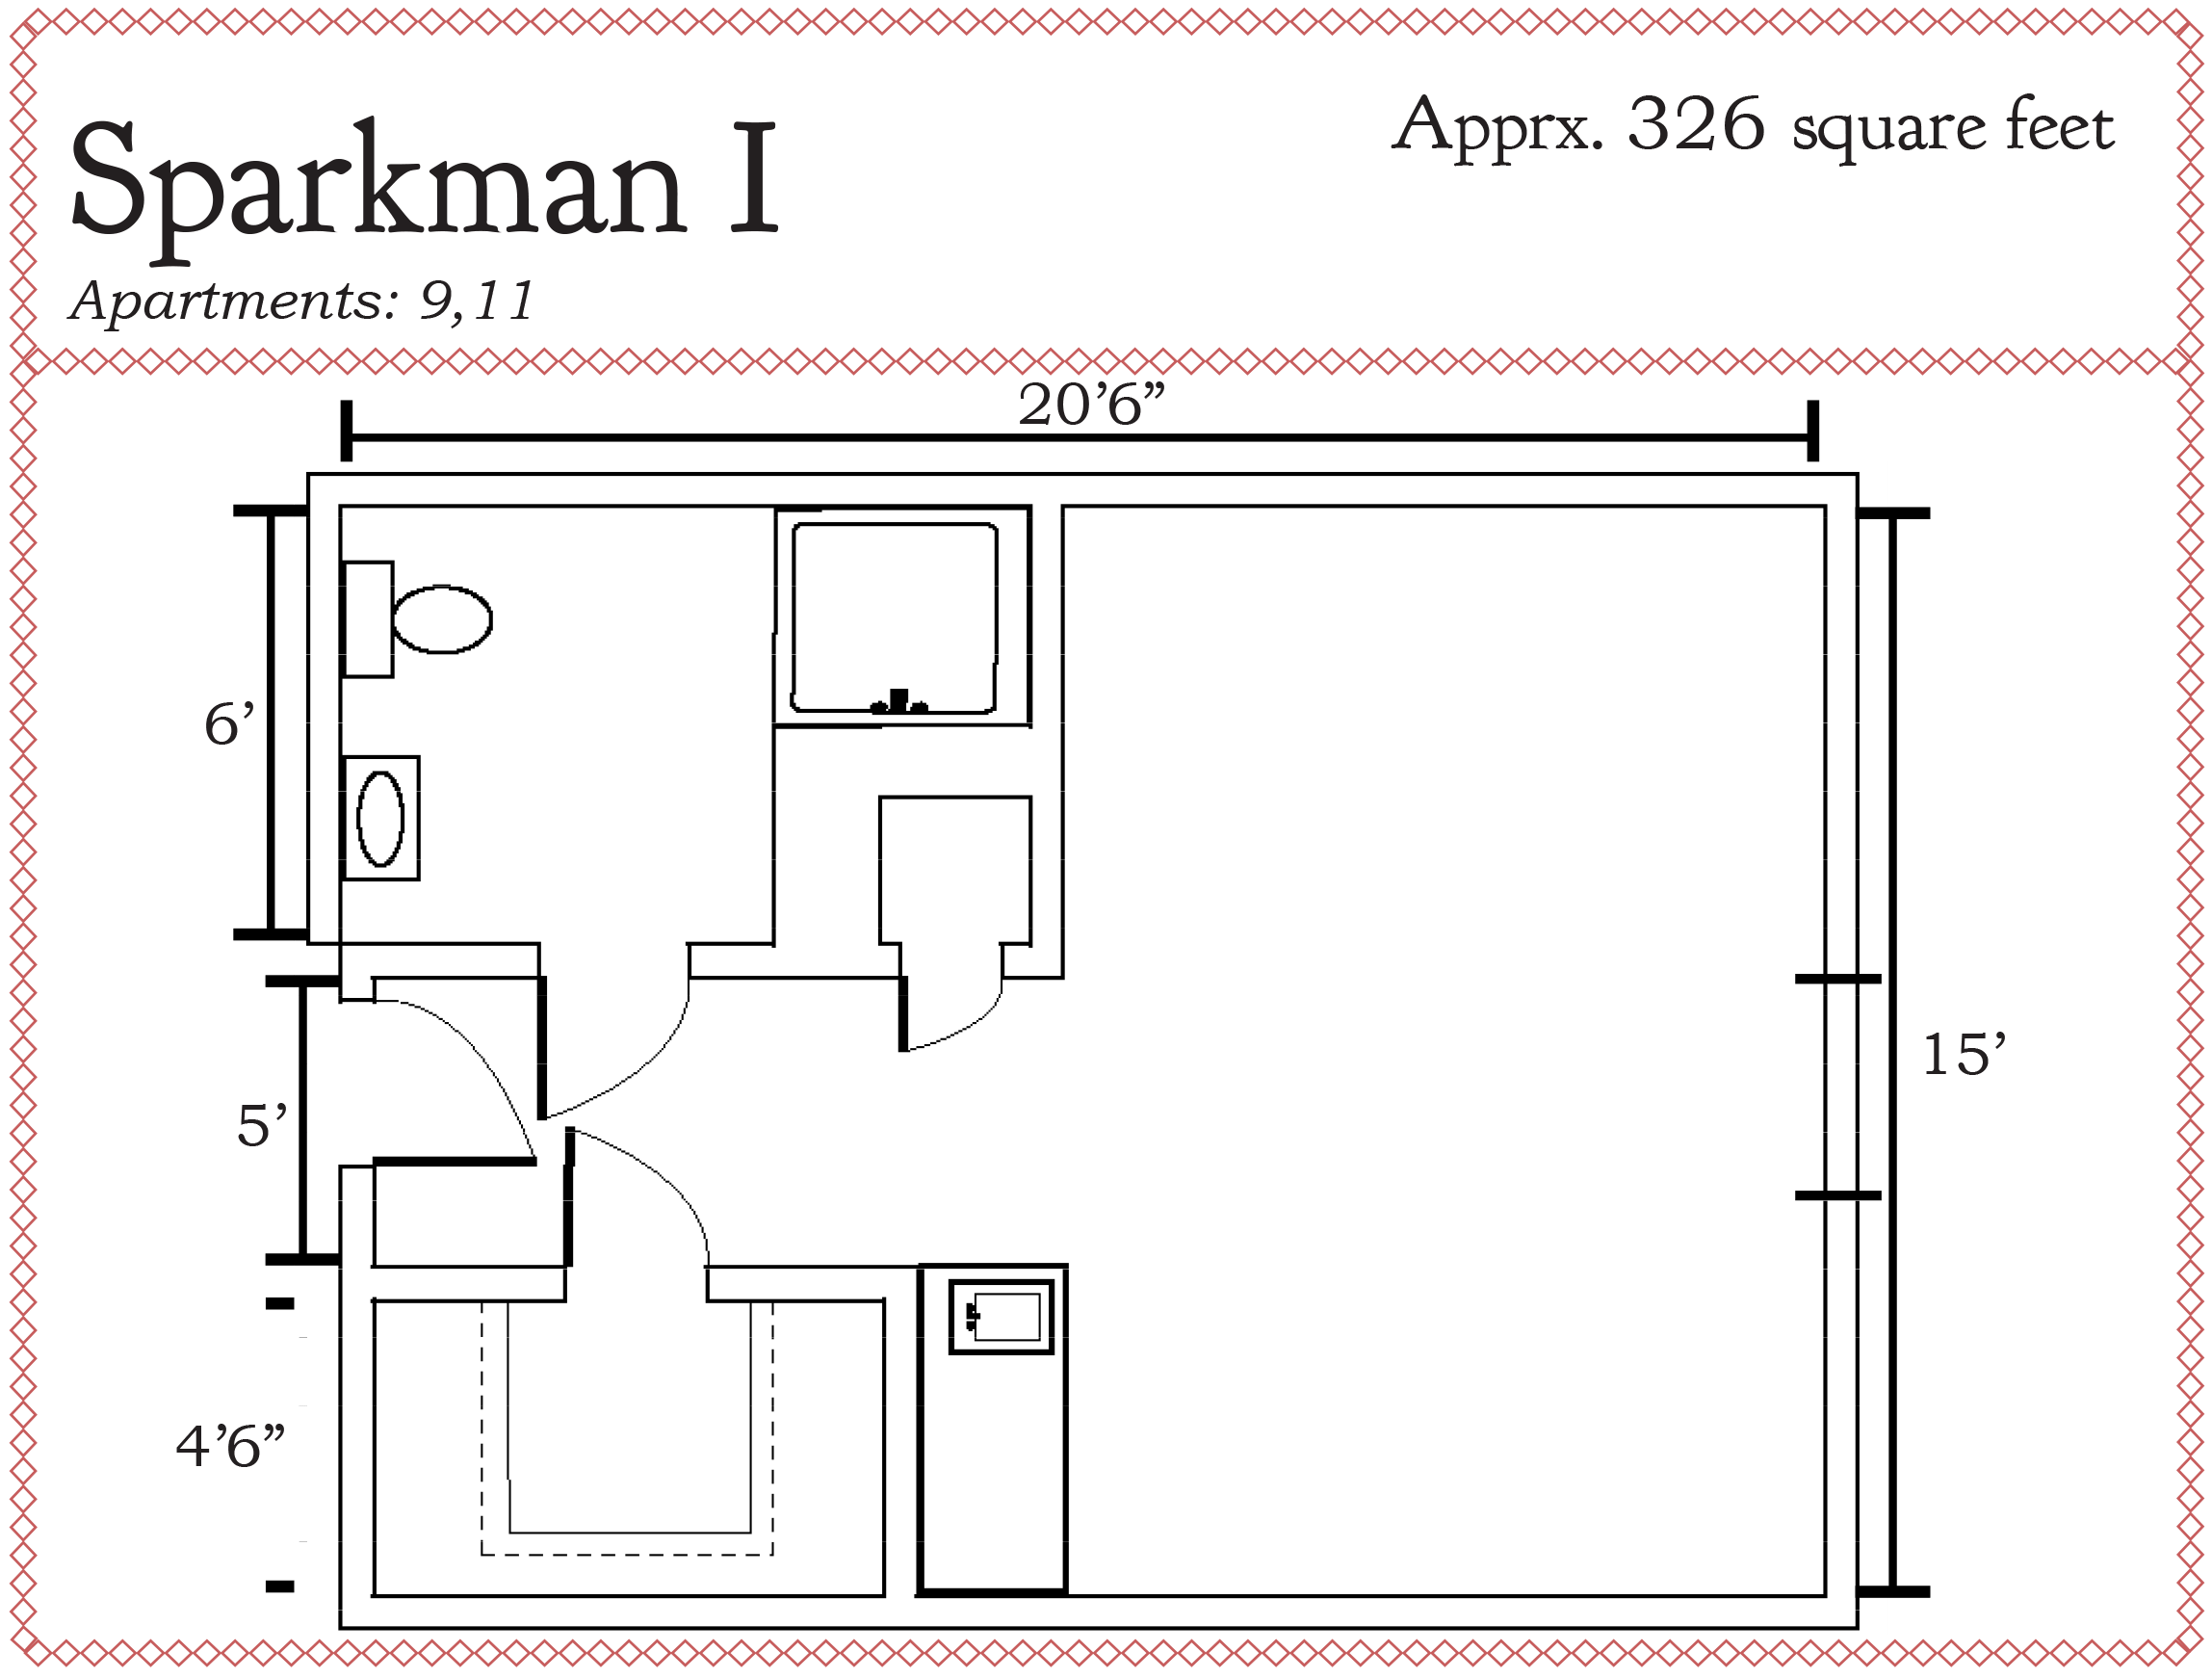 Sparkman I